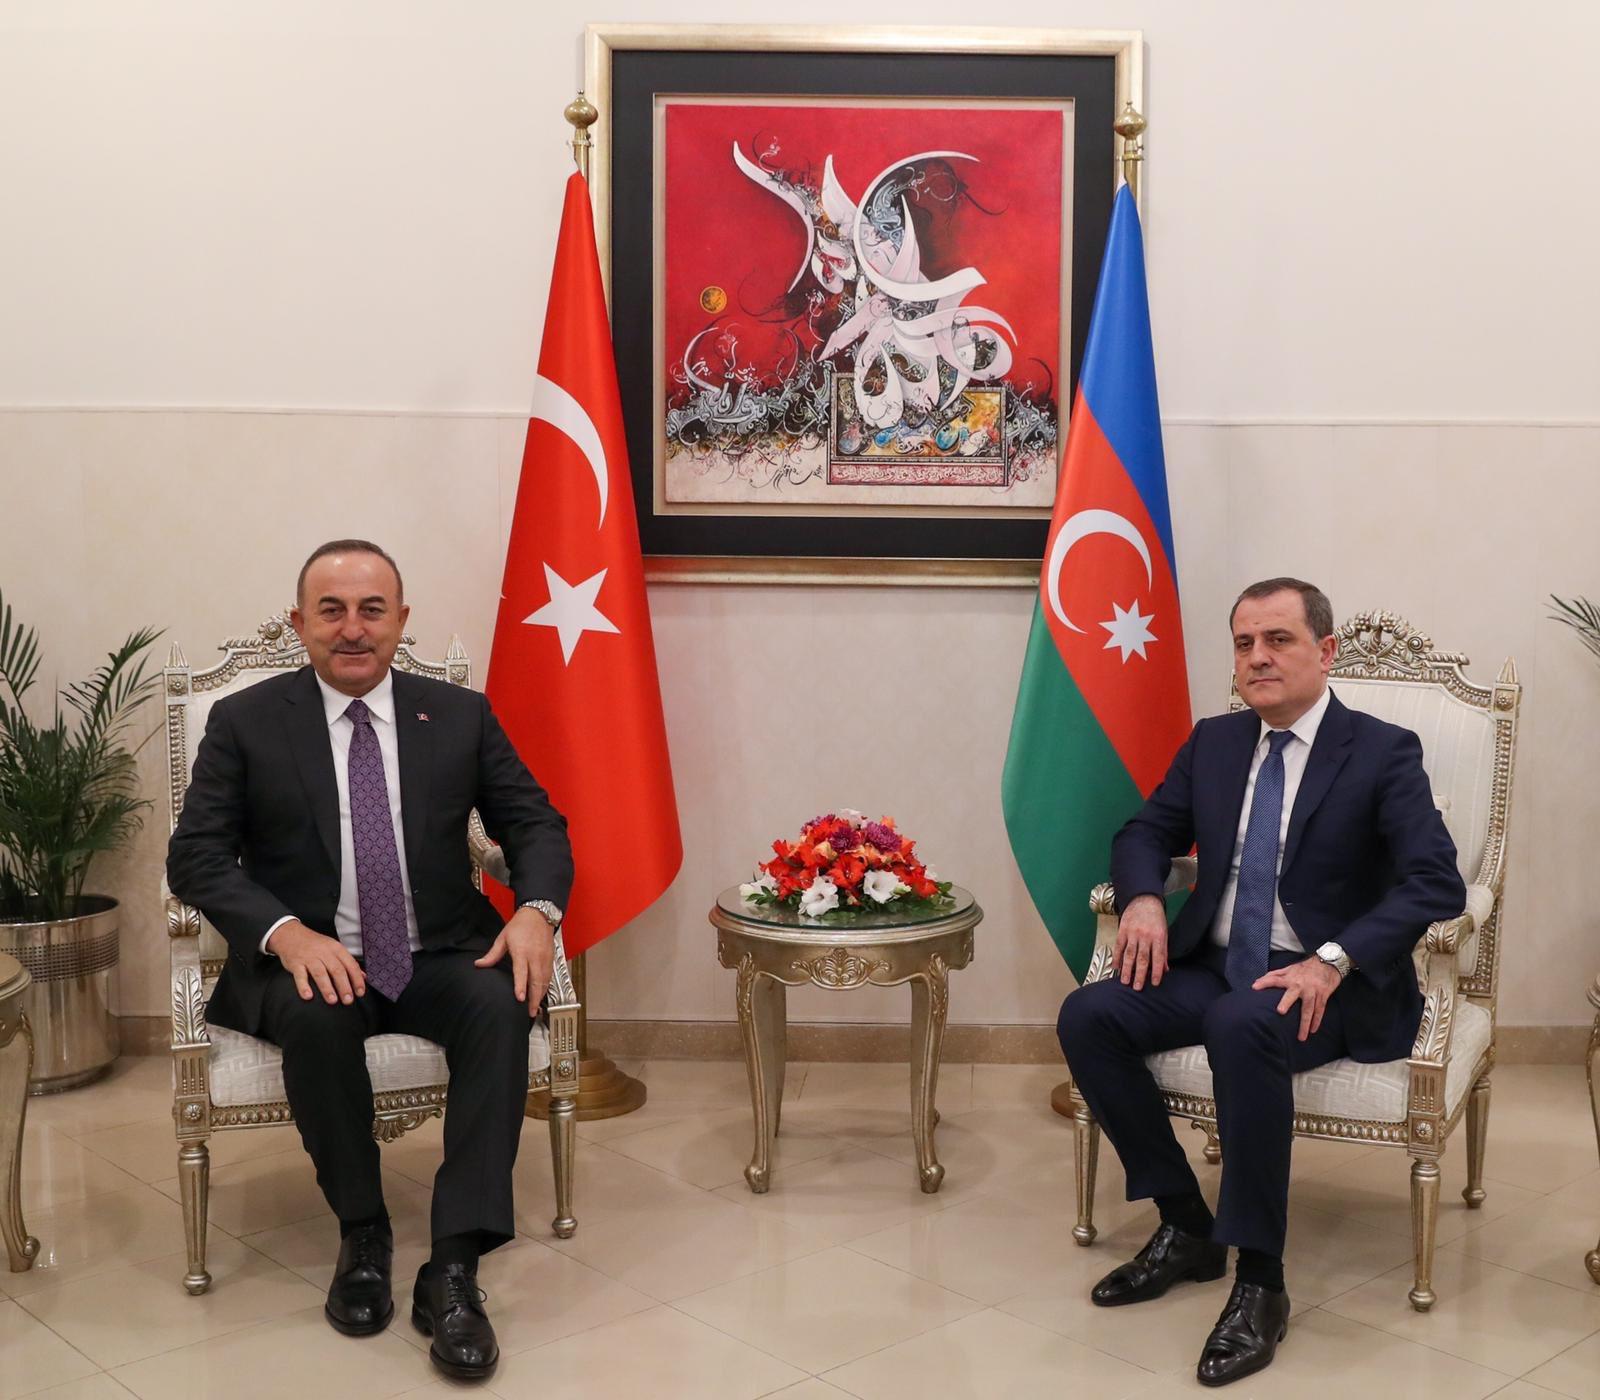 Photo of Իսլամաբադում հանդիպել են Թուրքիայի և Ադրբեջանի ԱԳ նախարարները